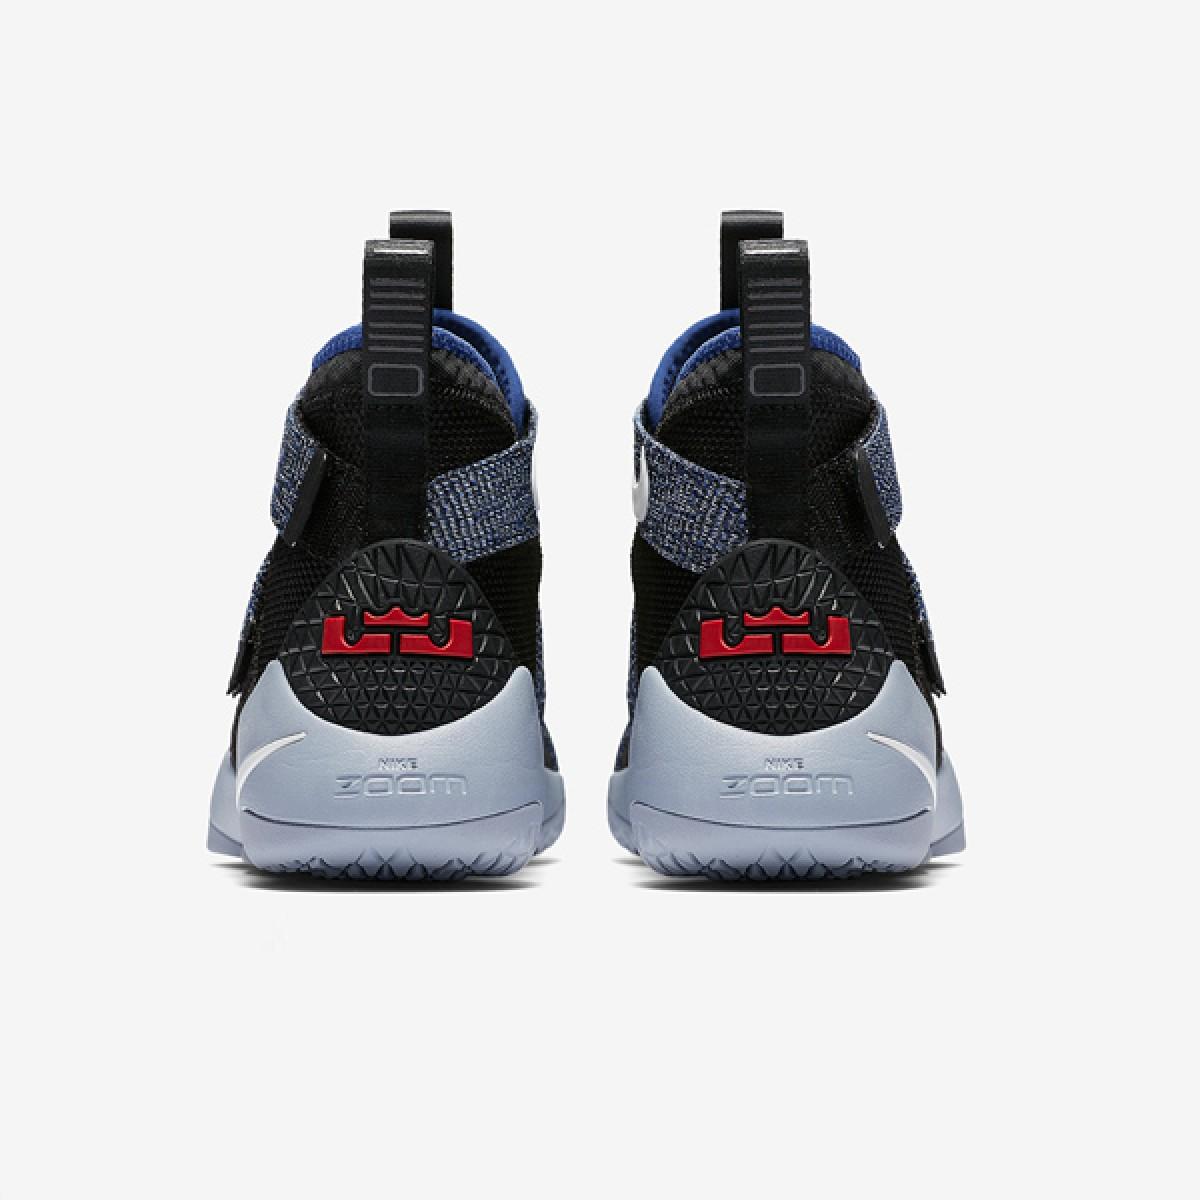 Nike Lebron Soldier XI 'Steel' 897644-005